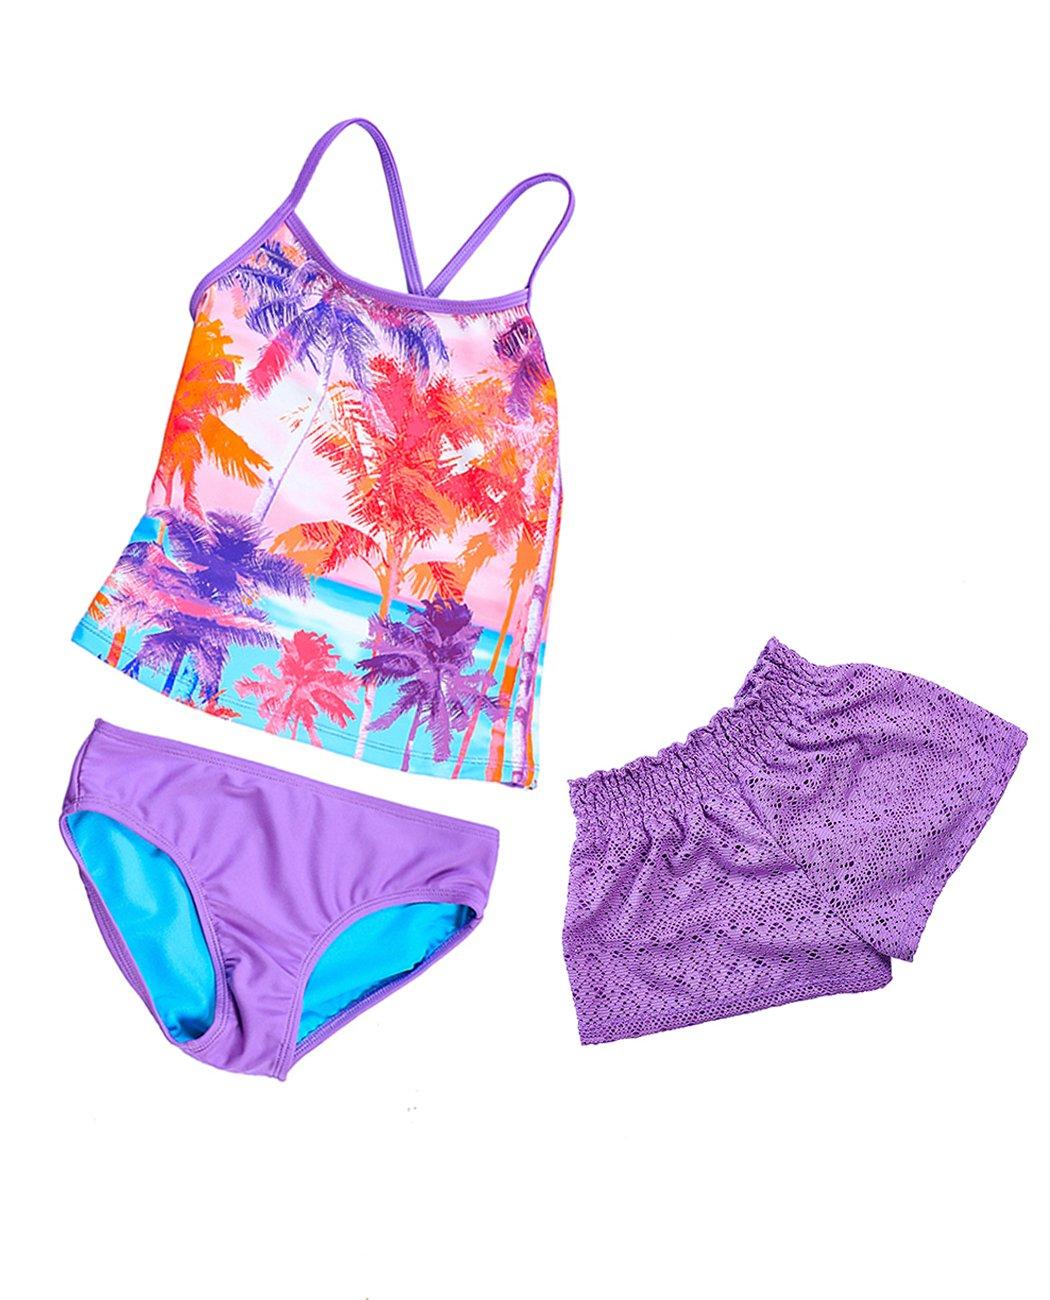 3 Piece Swimwear for Girls, Criss Cross Bathing Suit Cute Purple Siwmsuit with Jacquard Beach Boyshort